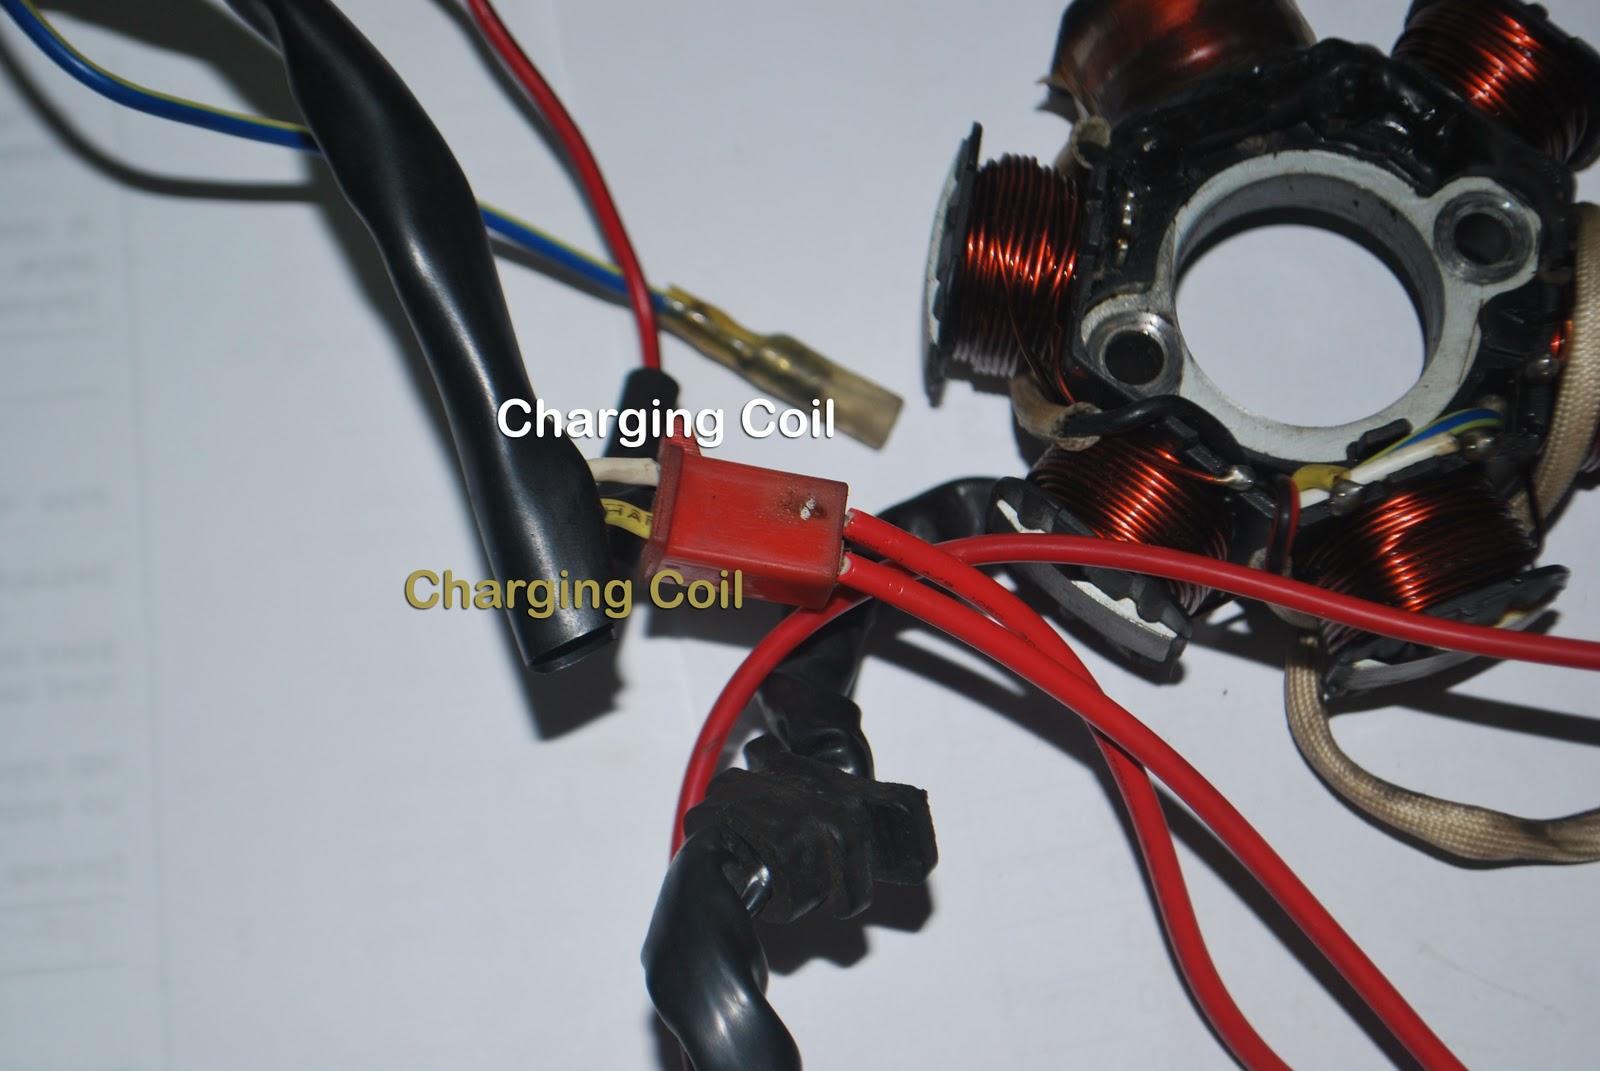 Honda Accord Radio Wiring Diagram On Wiring Diagram For 2011 Honda